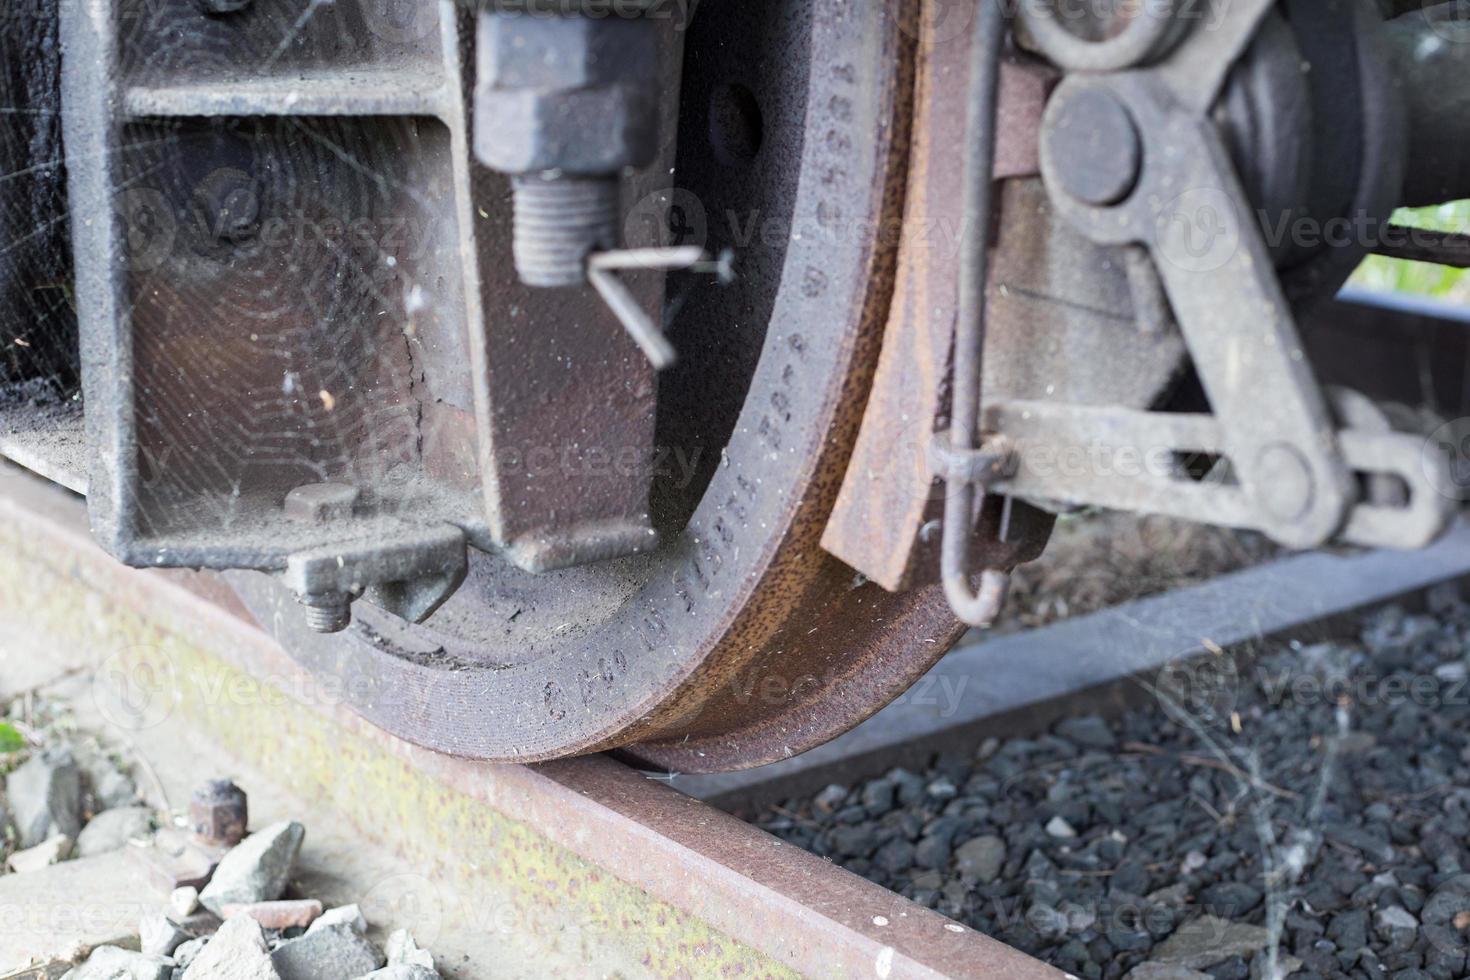 Train wheel close up photo